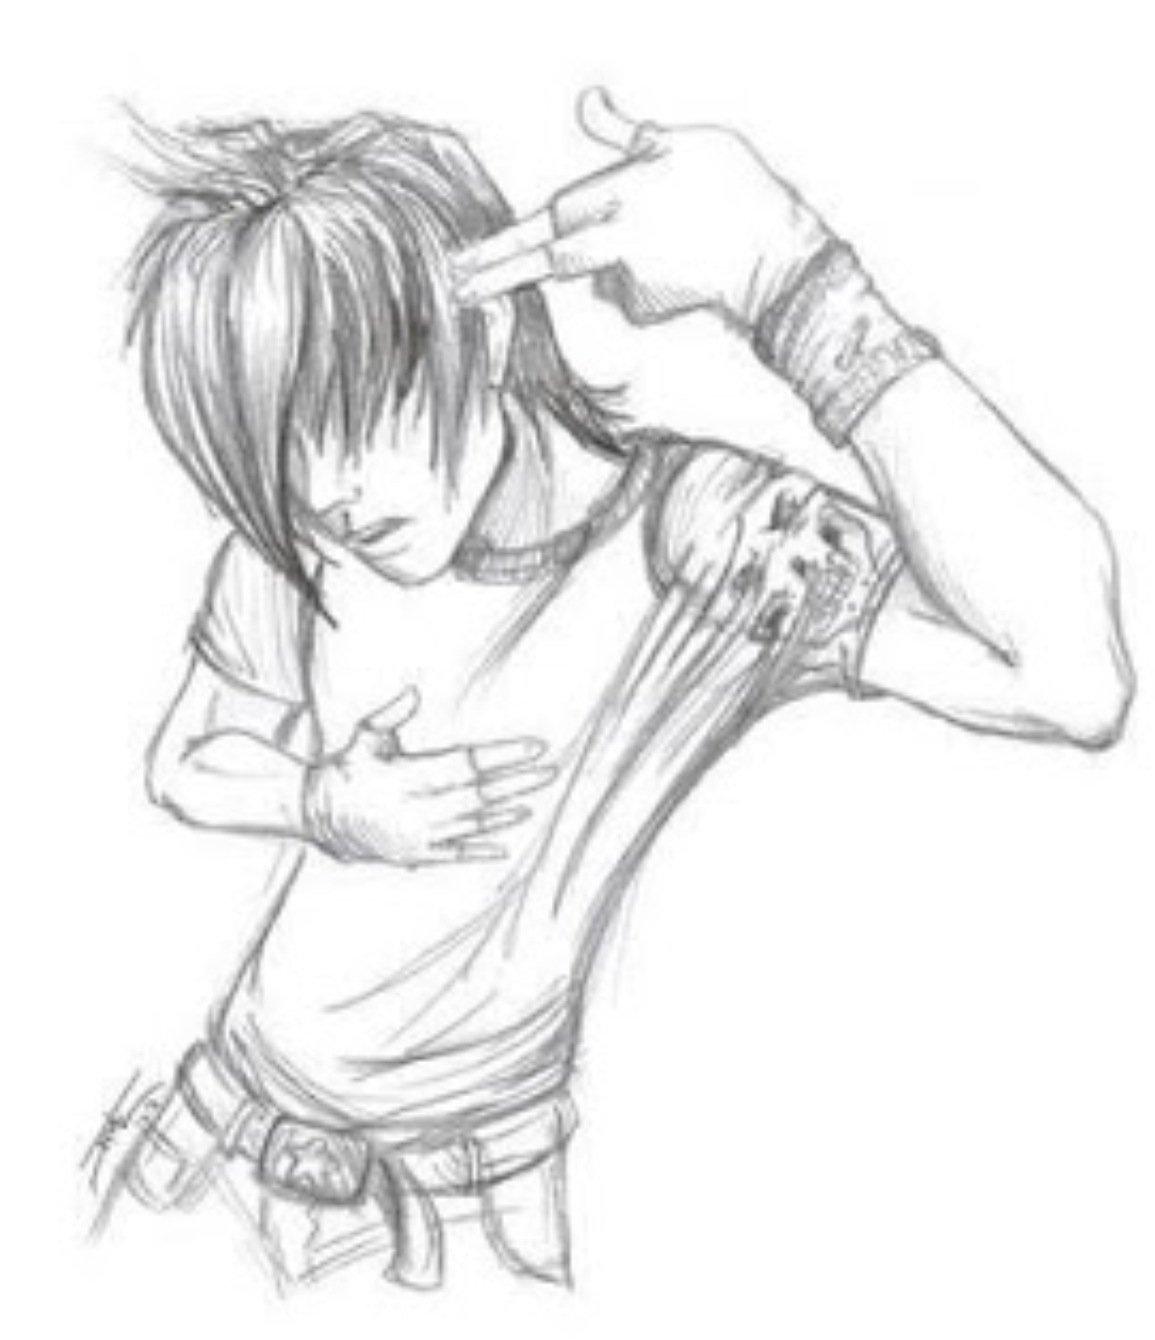 Hot Anime Girl Drawing at GetDrawings